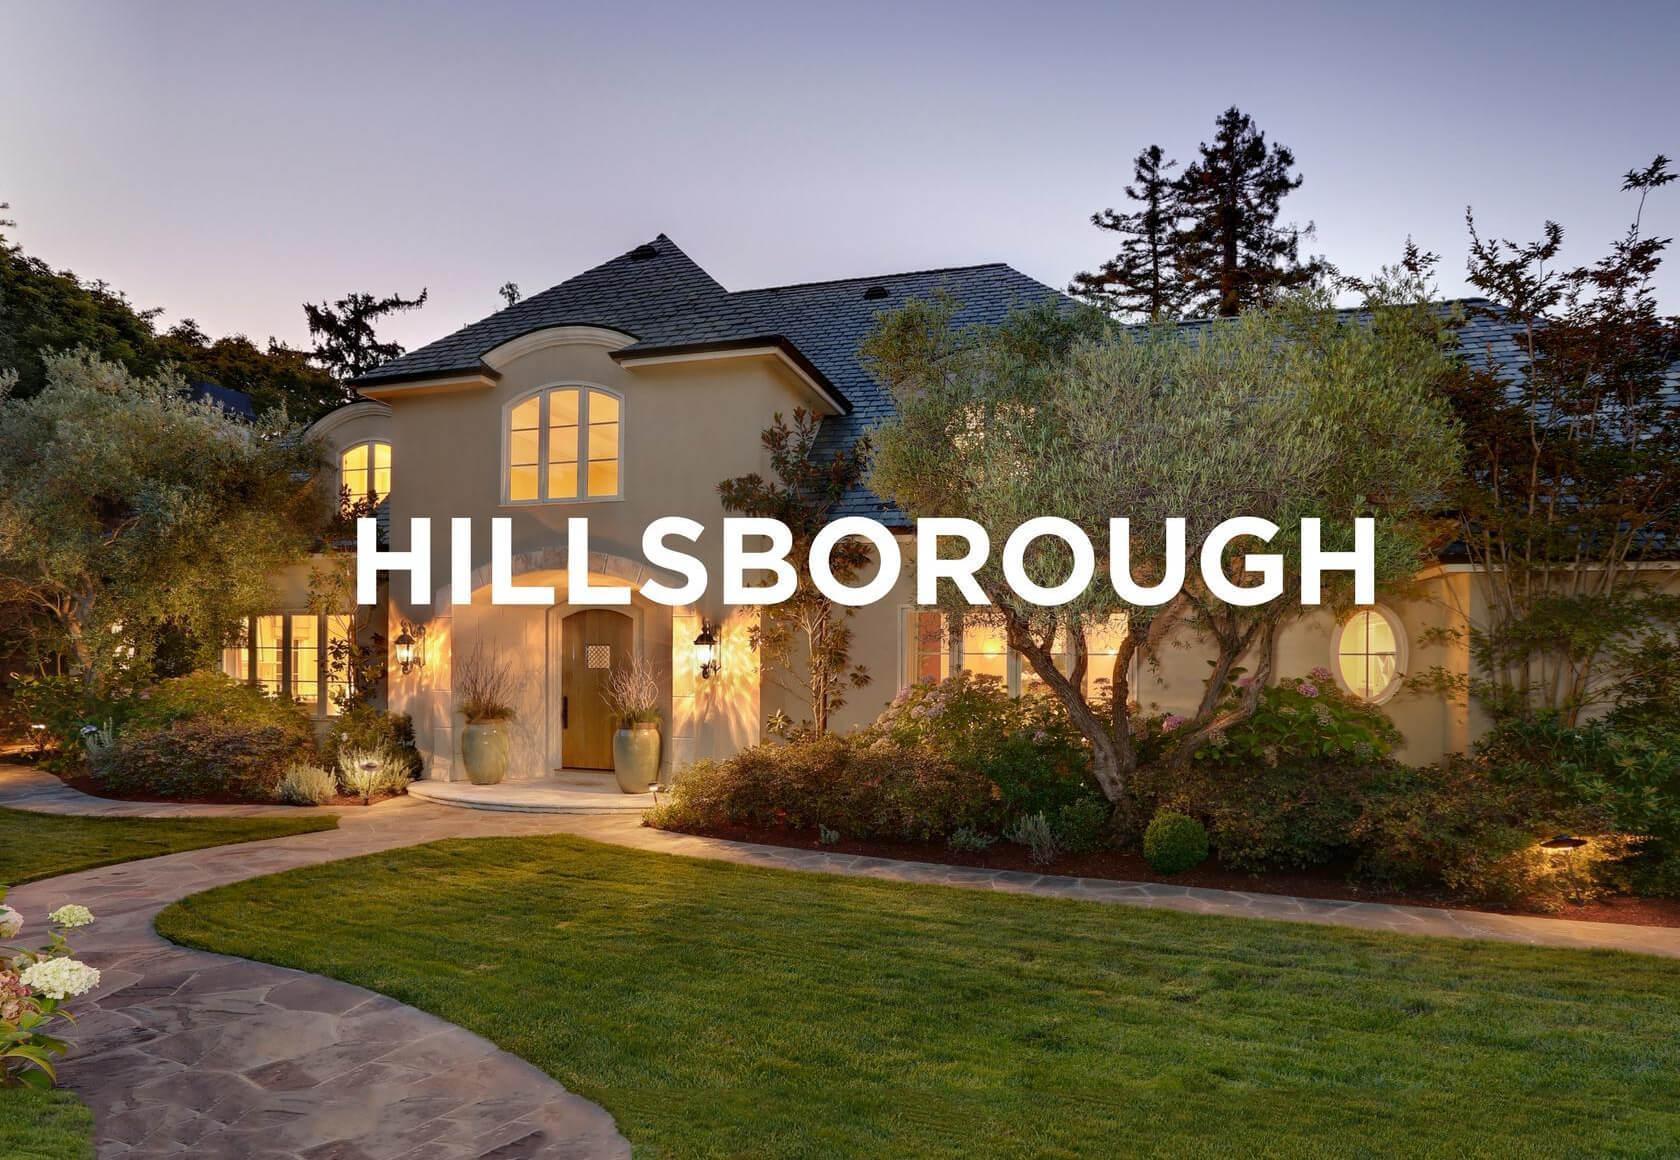 Hillsborough